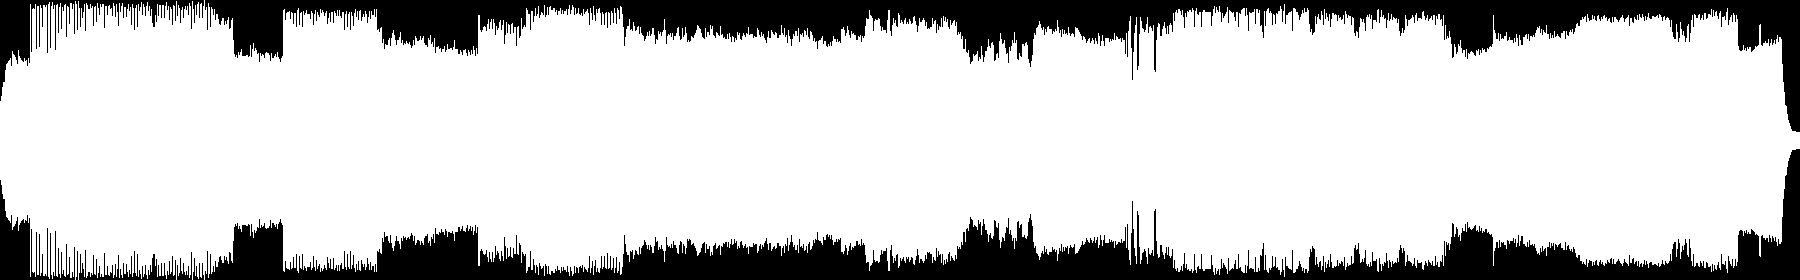 Aiyn Zahev - Sphere Zebra2 audio waveform